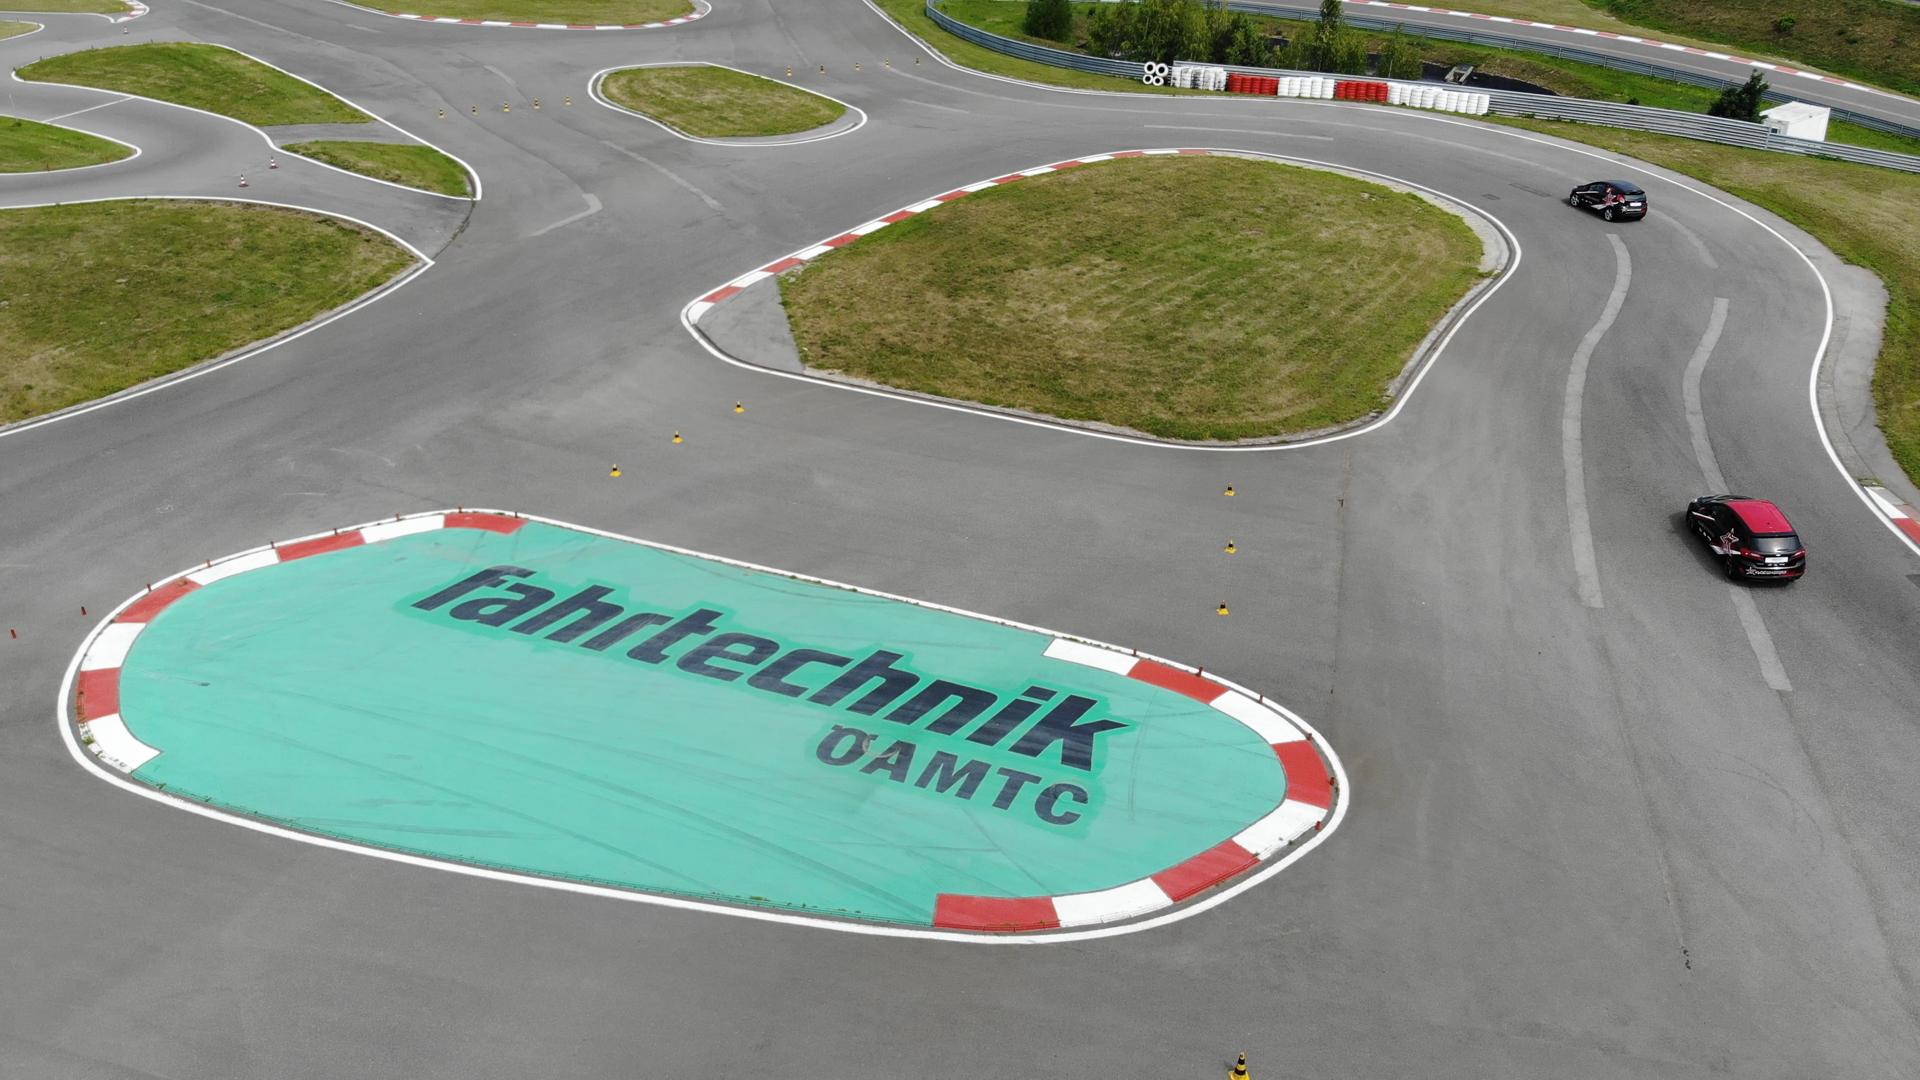 RacingRookie_2018_Vorausscheidung03_Melk_Screenshot_AUTrenalinMEDIA-01.jpg